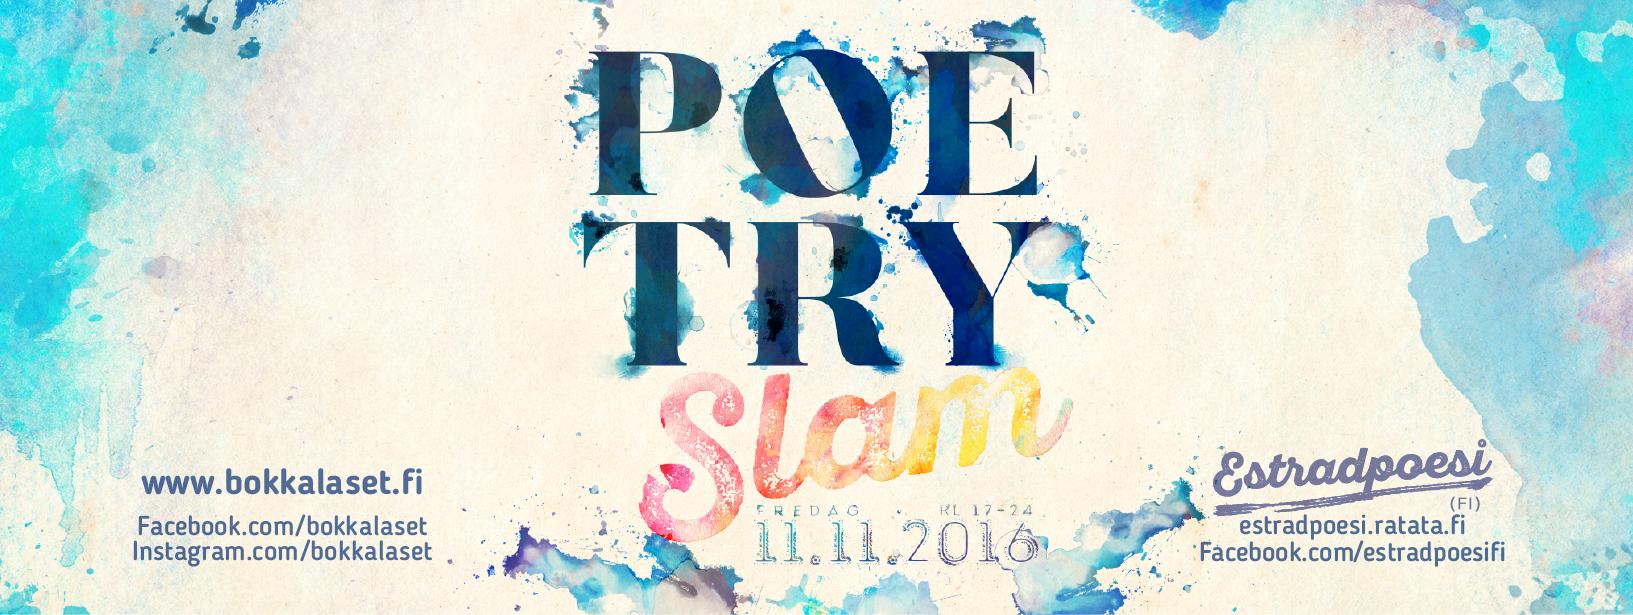 dizi poetry slam estradpoesiFI estradpoesi finlandssvensk